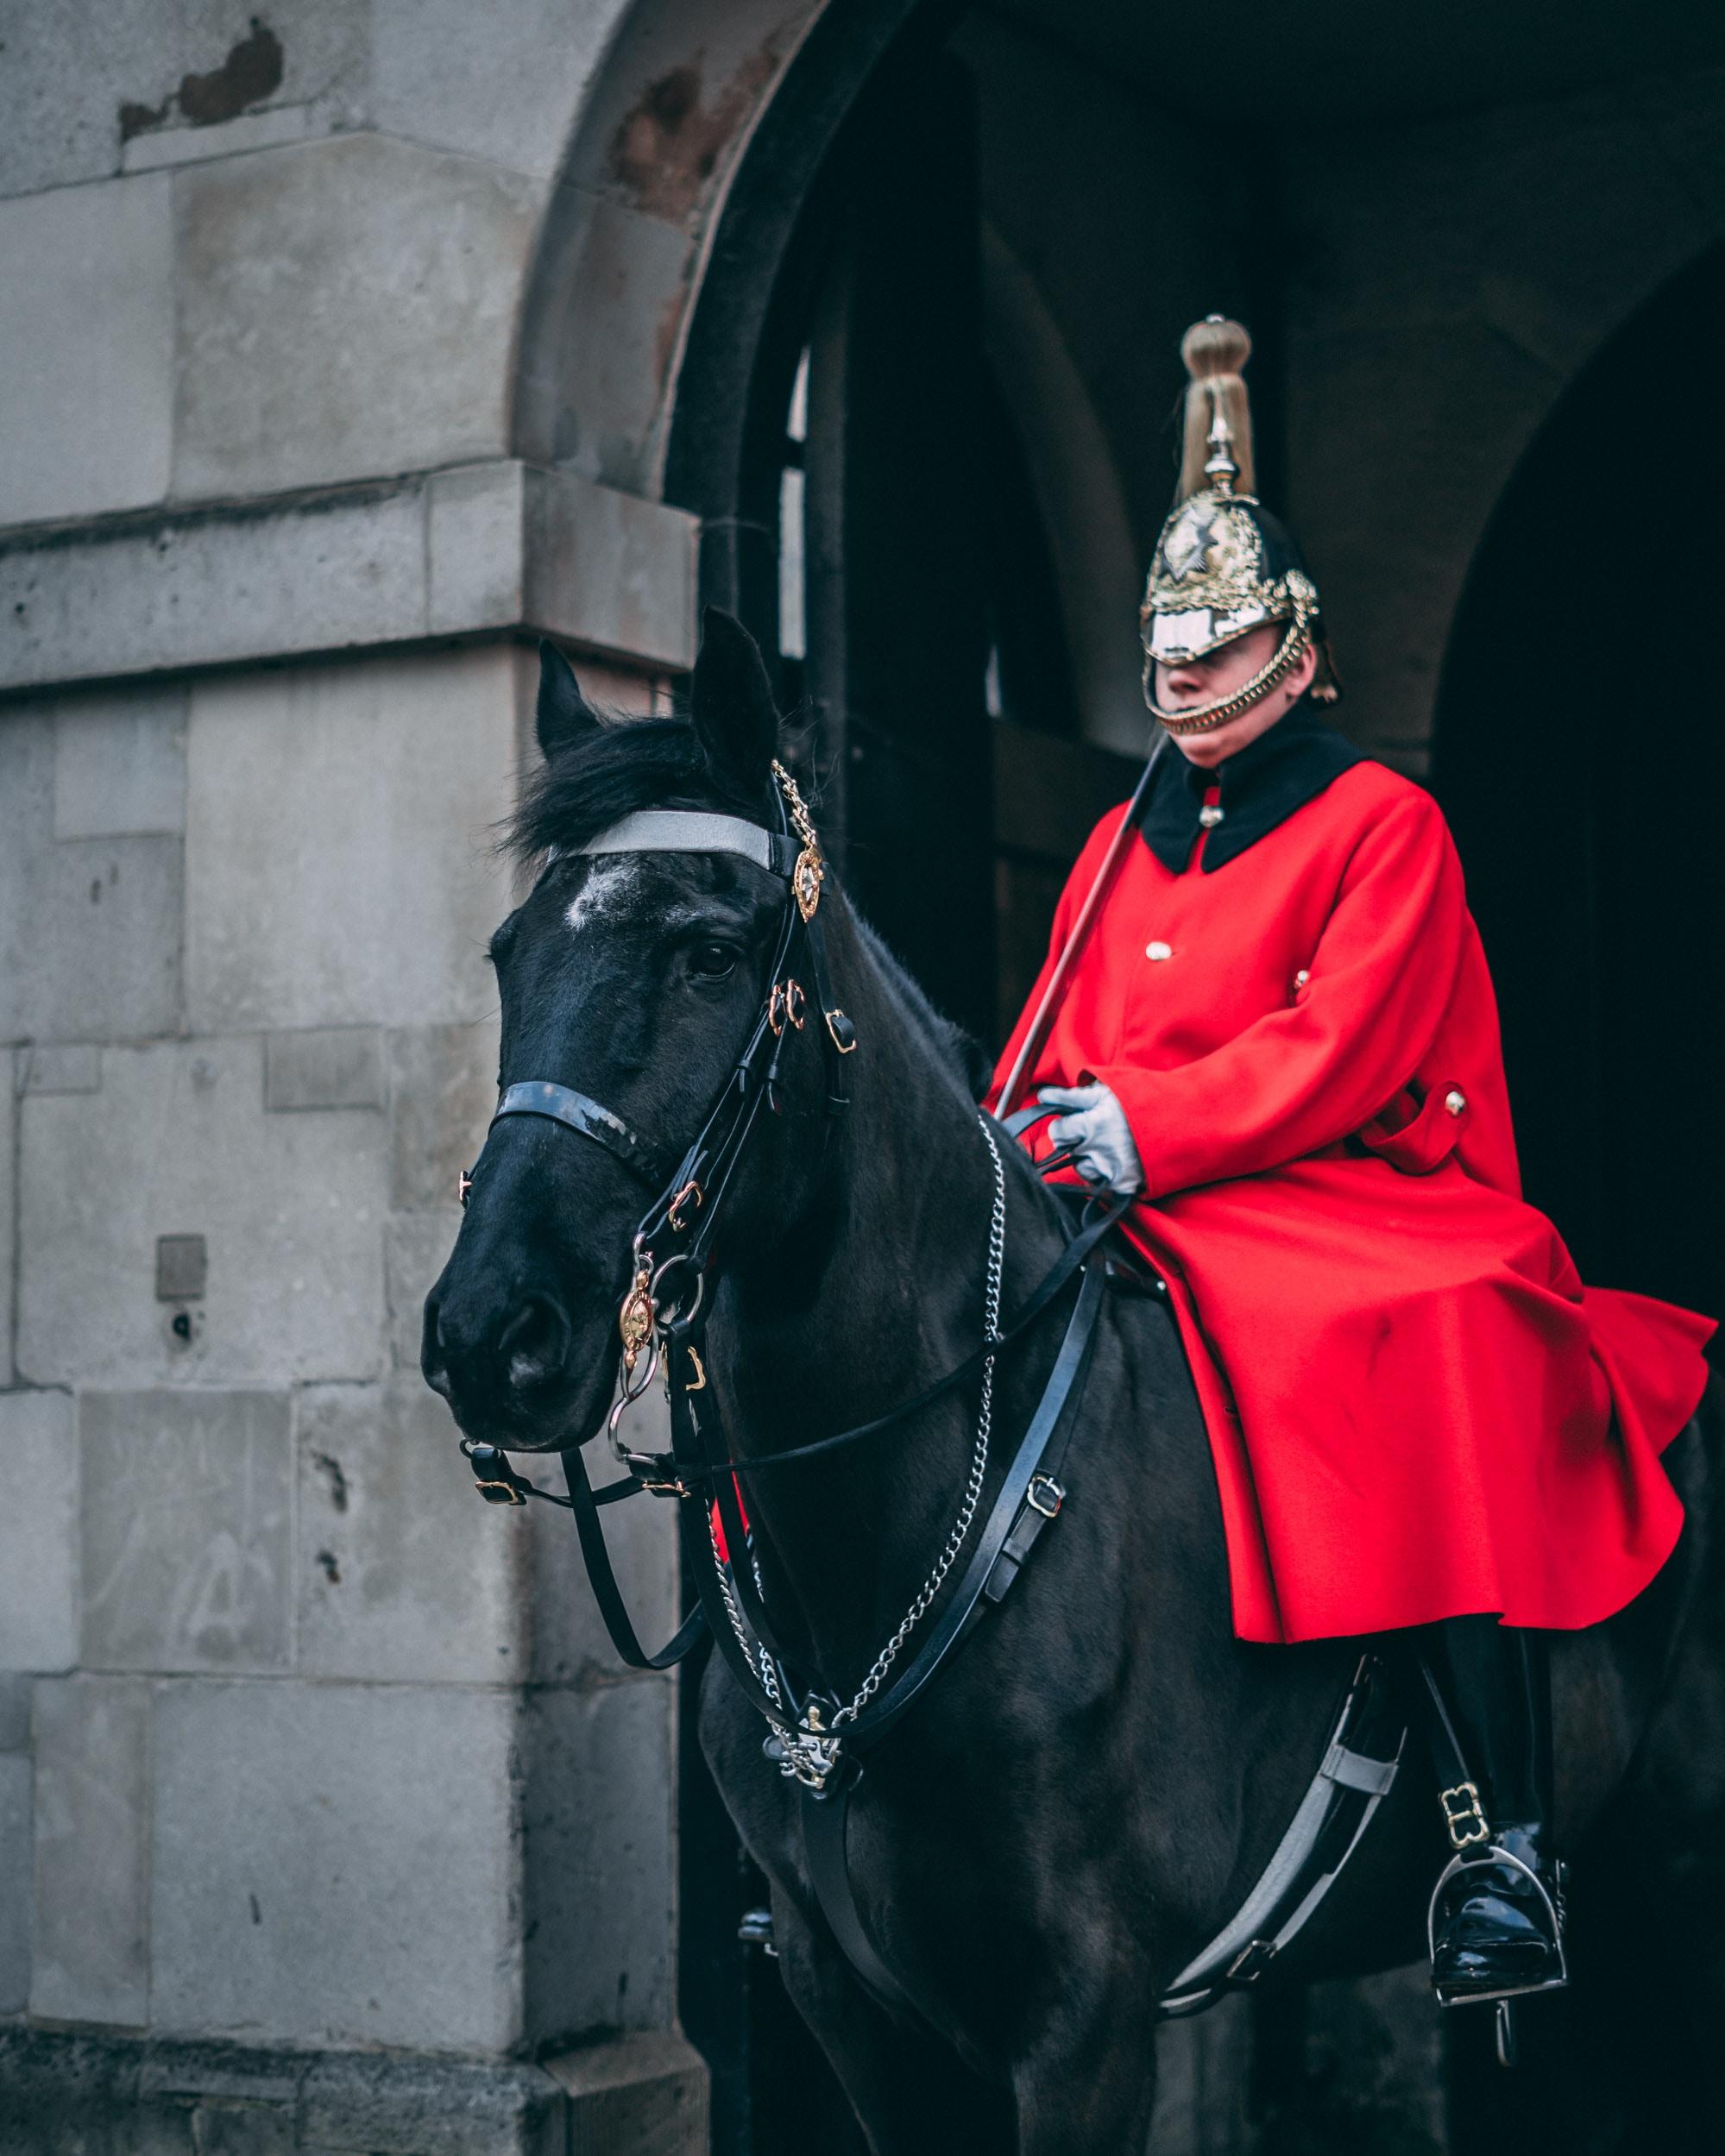 man wearing red coat riding on black horse